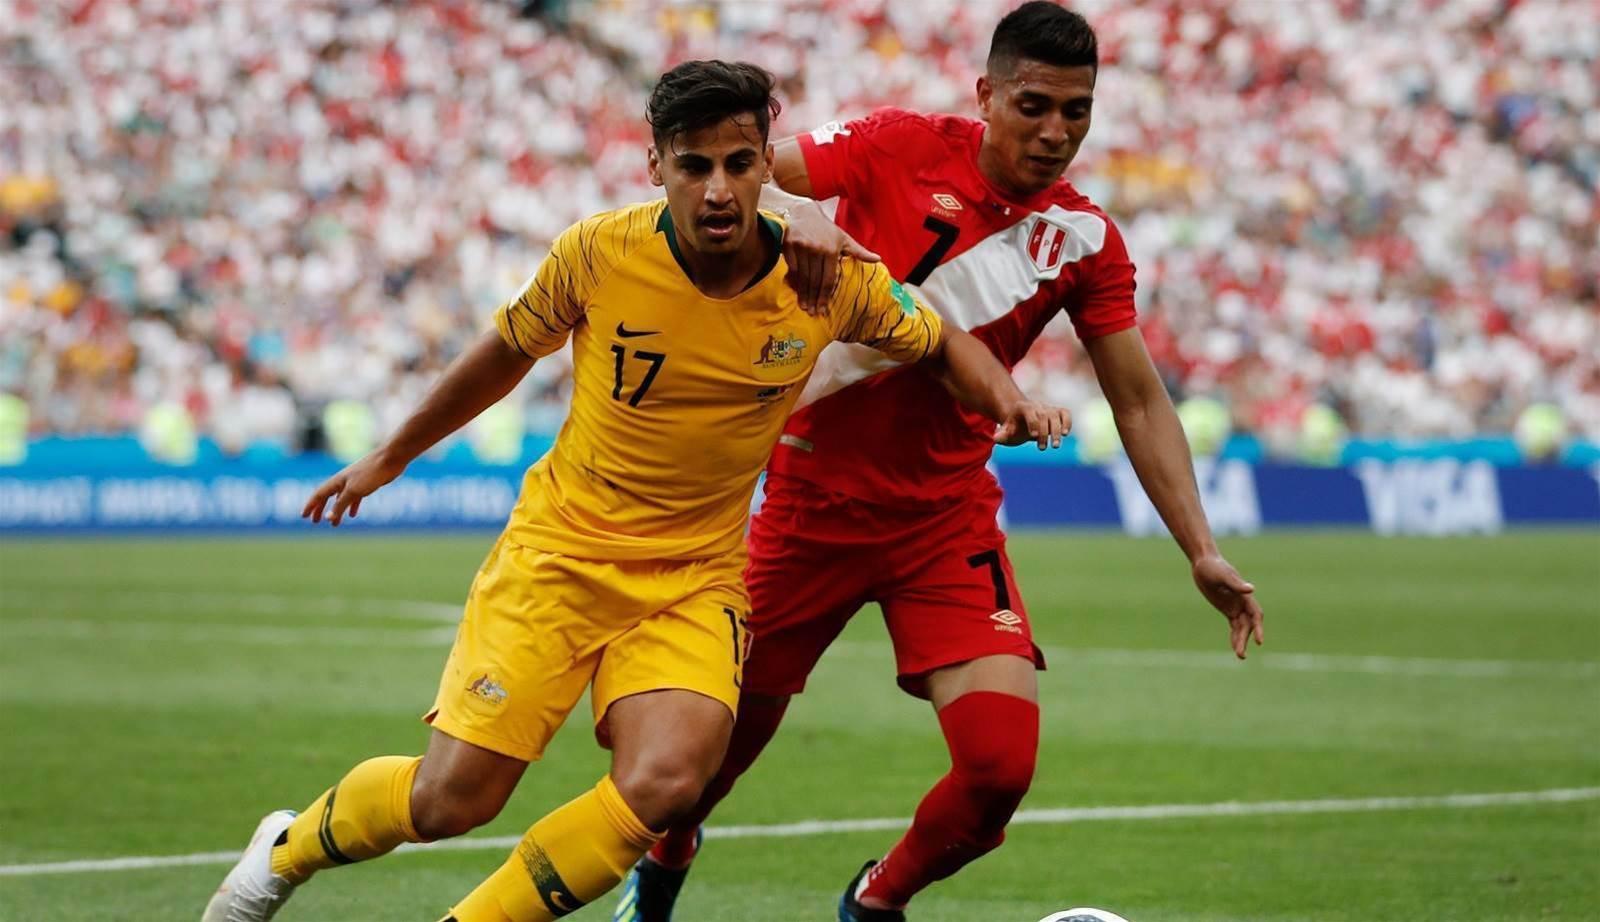 Sports science guru: Arzani can come back stronger